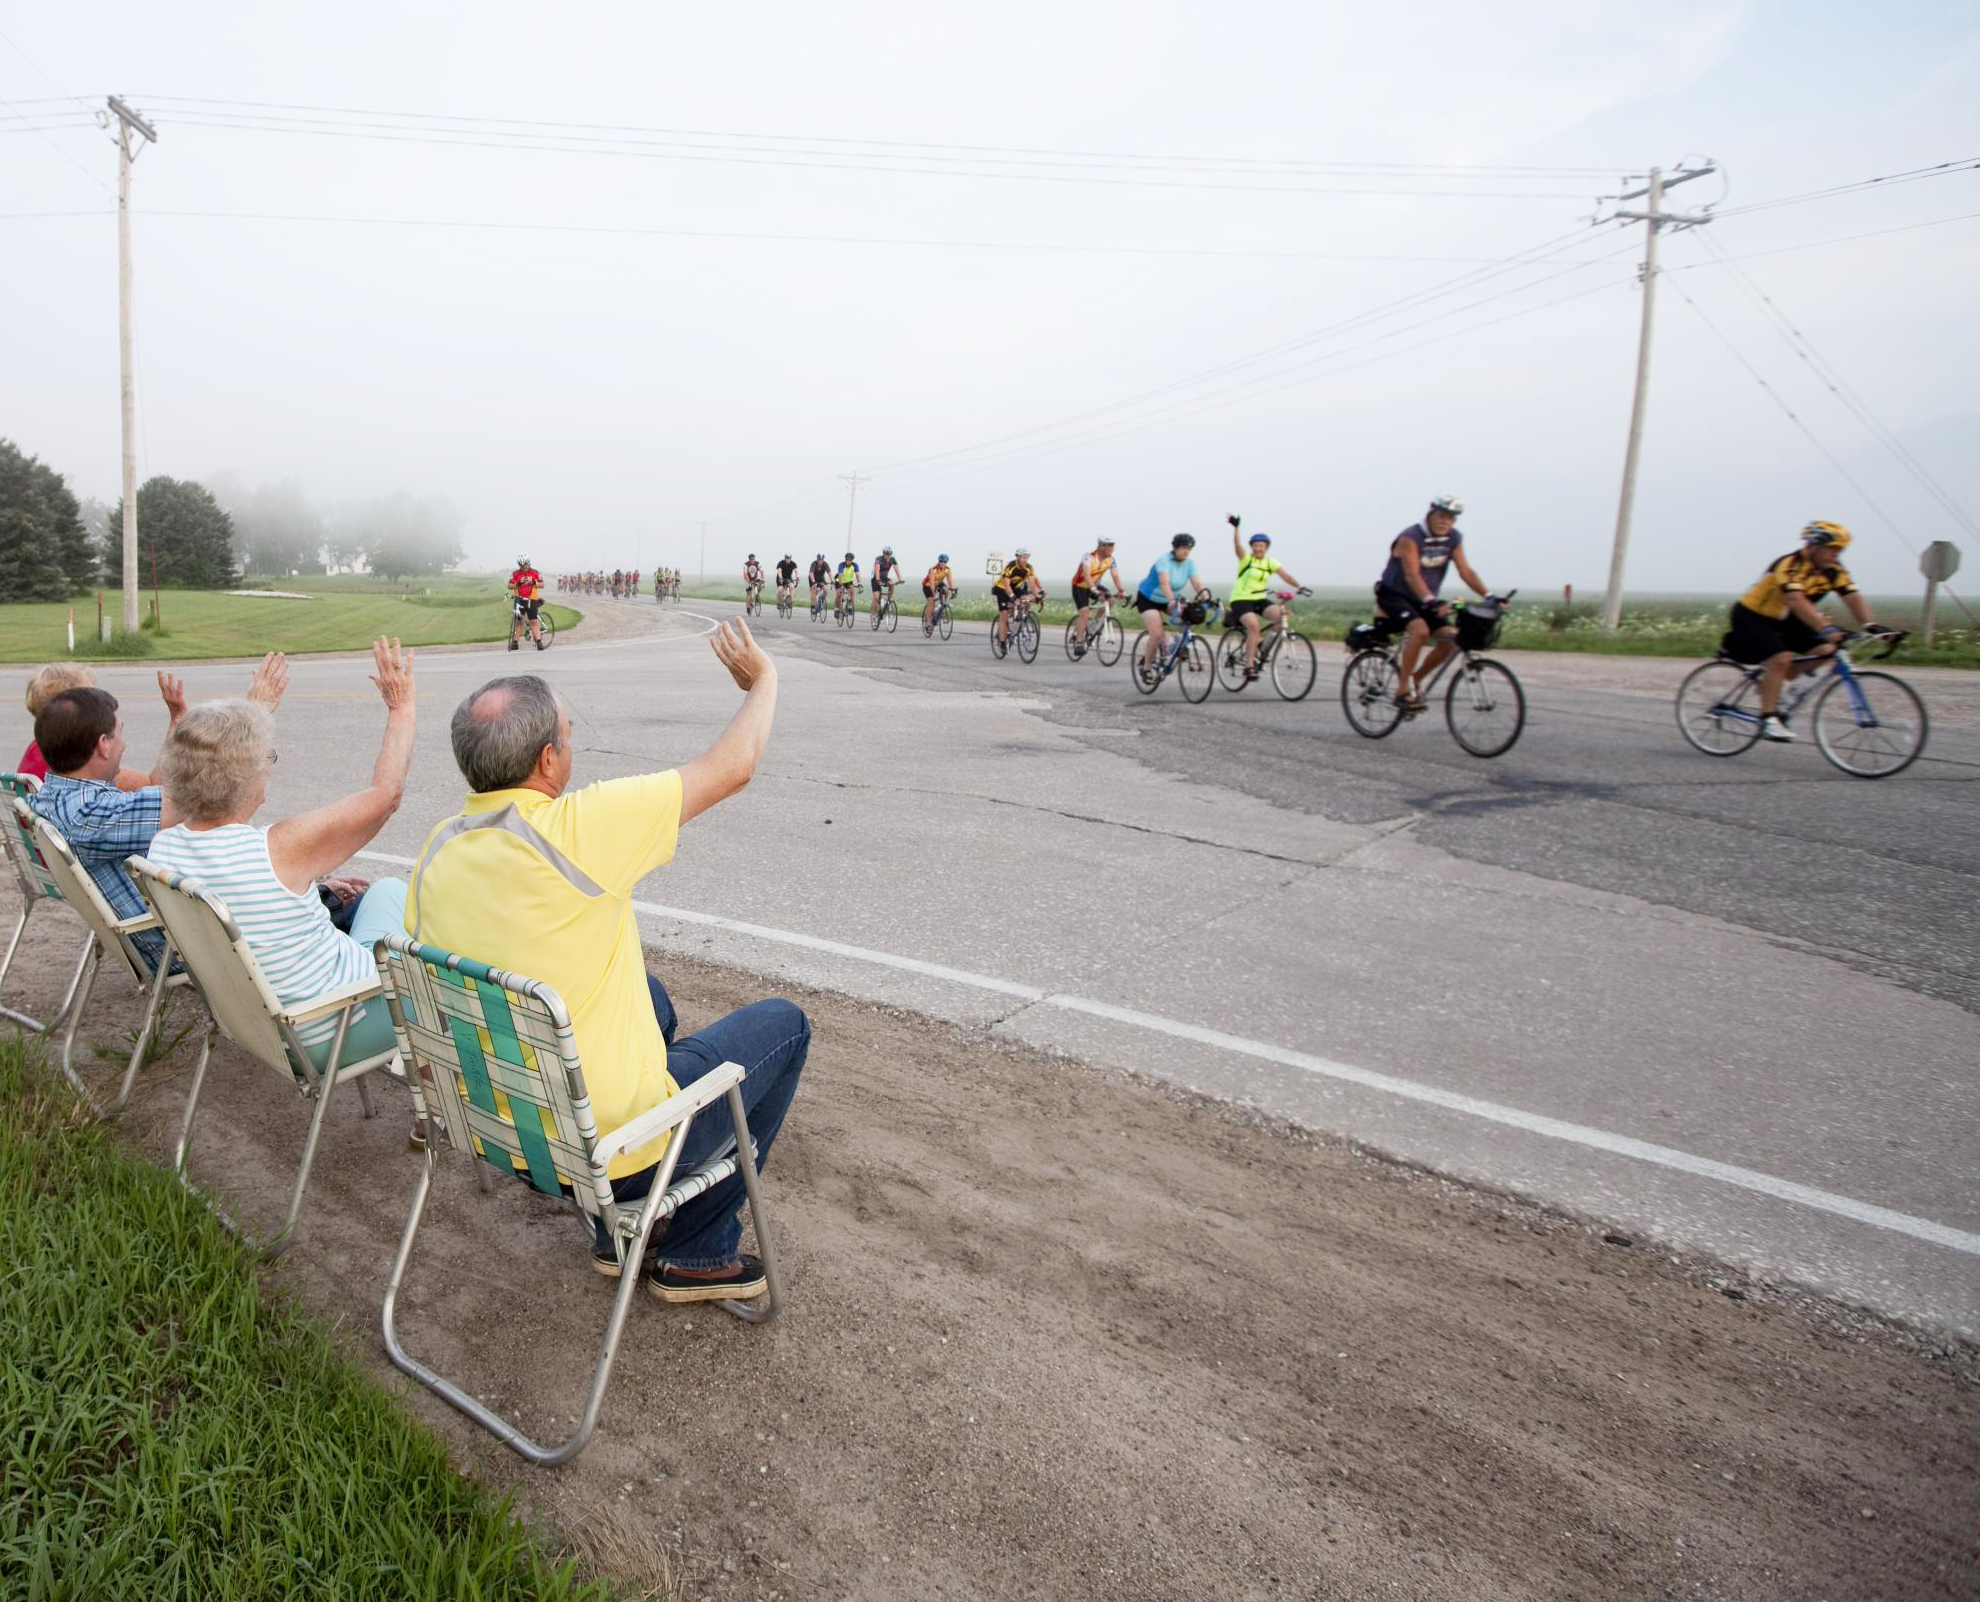 RAGBRAI riders and Iowan locals waving.